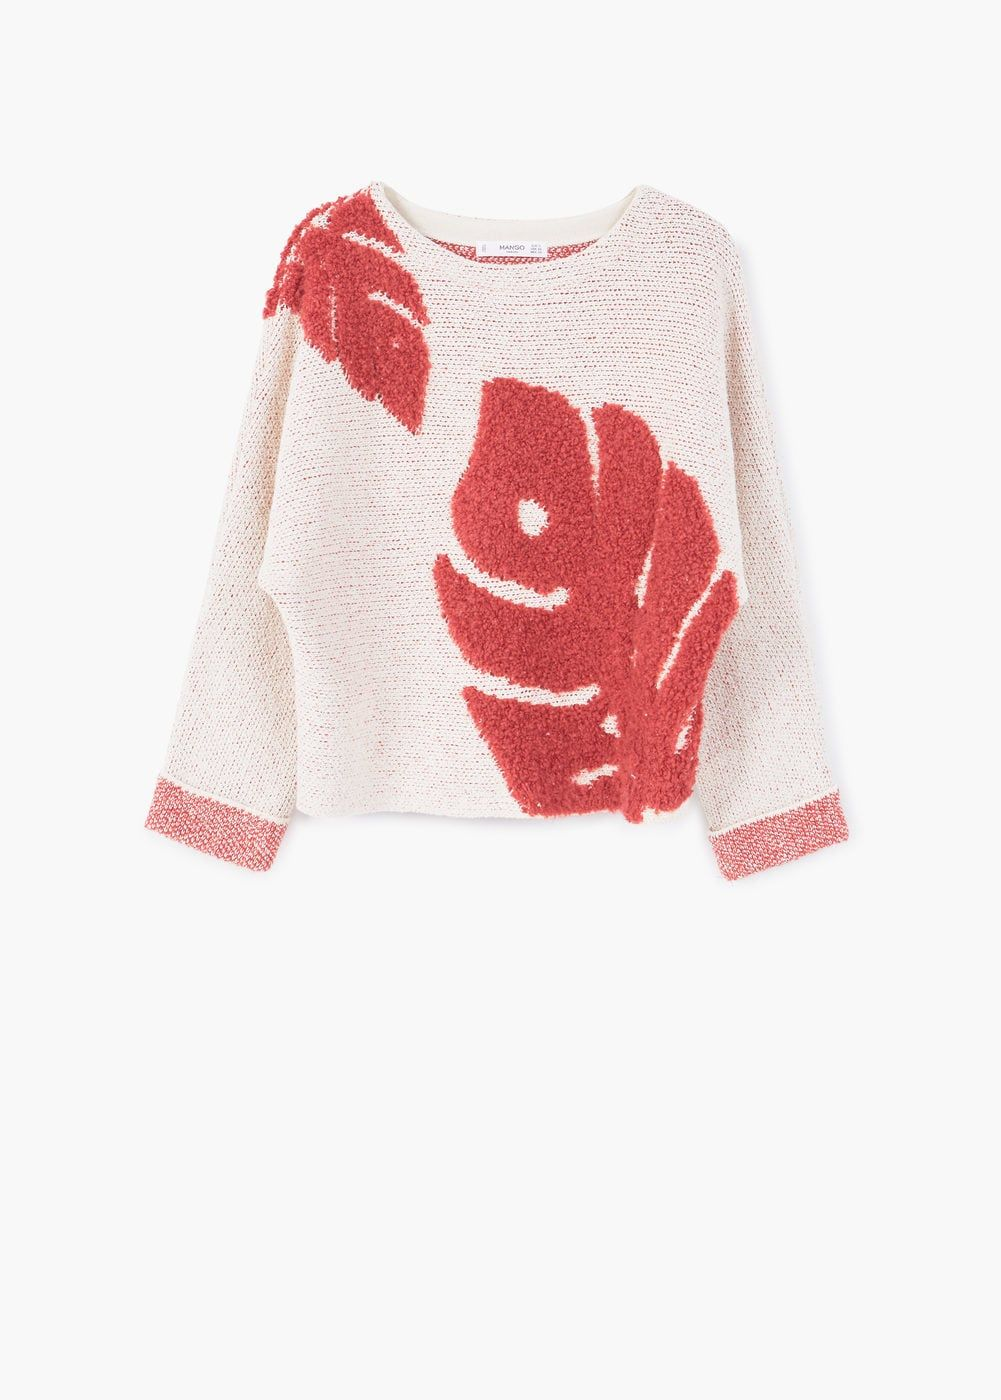 Jersey algodón textura - Mujer | BOUTIQUEROS | Pinterest | Textura ...